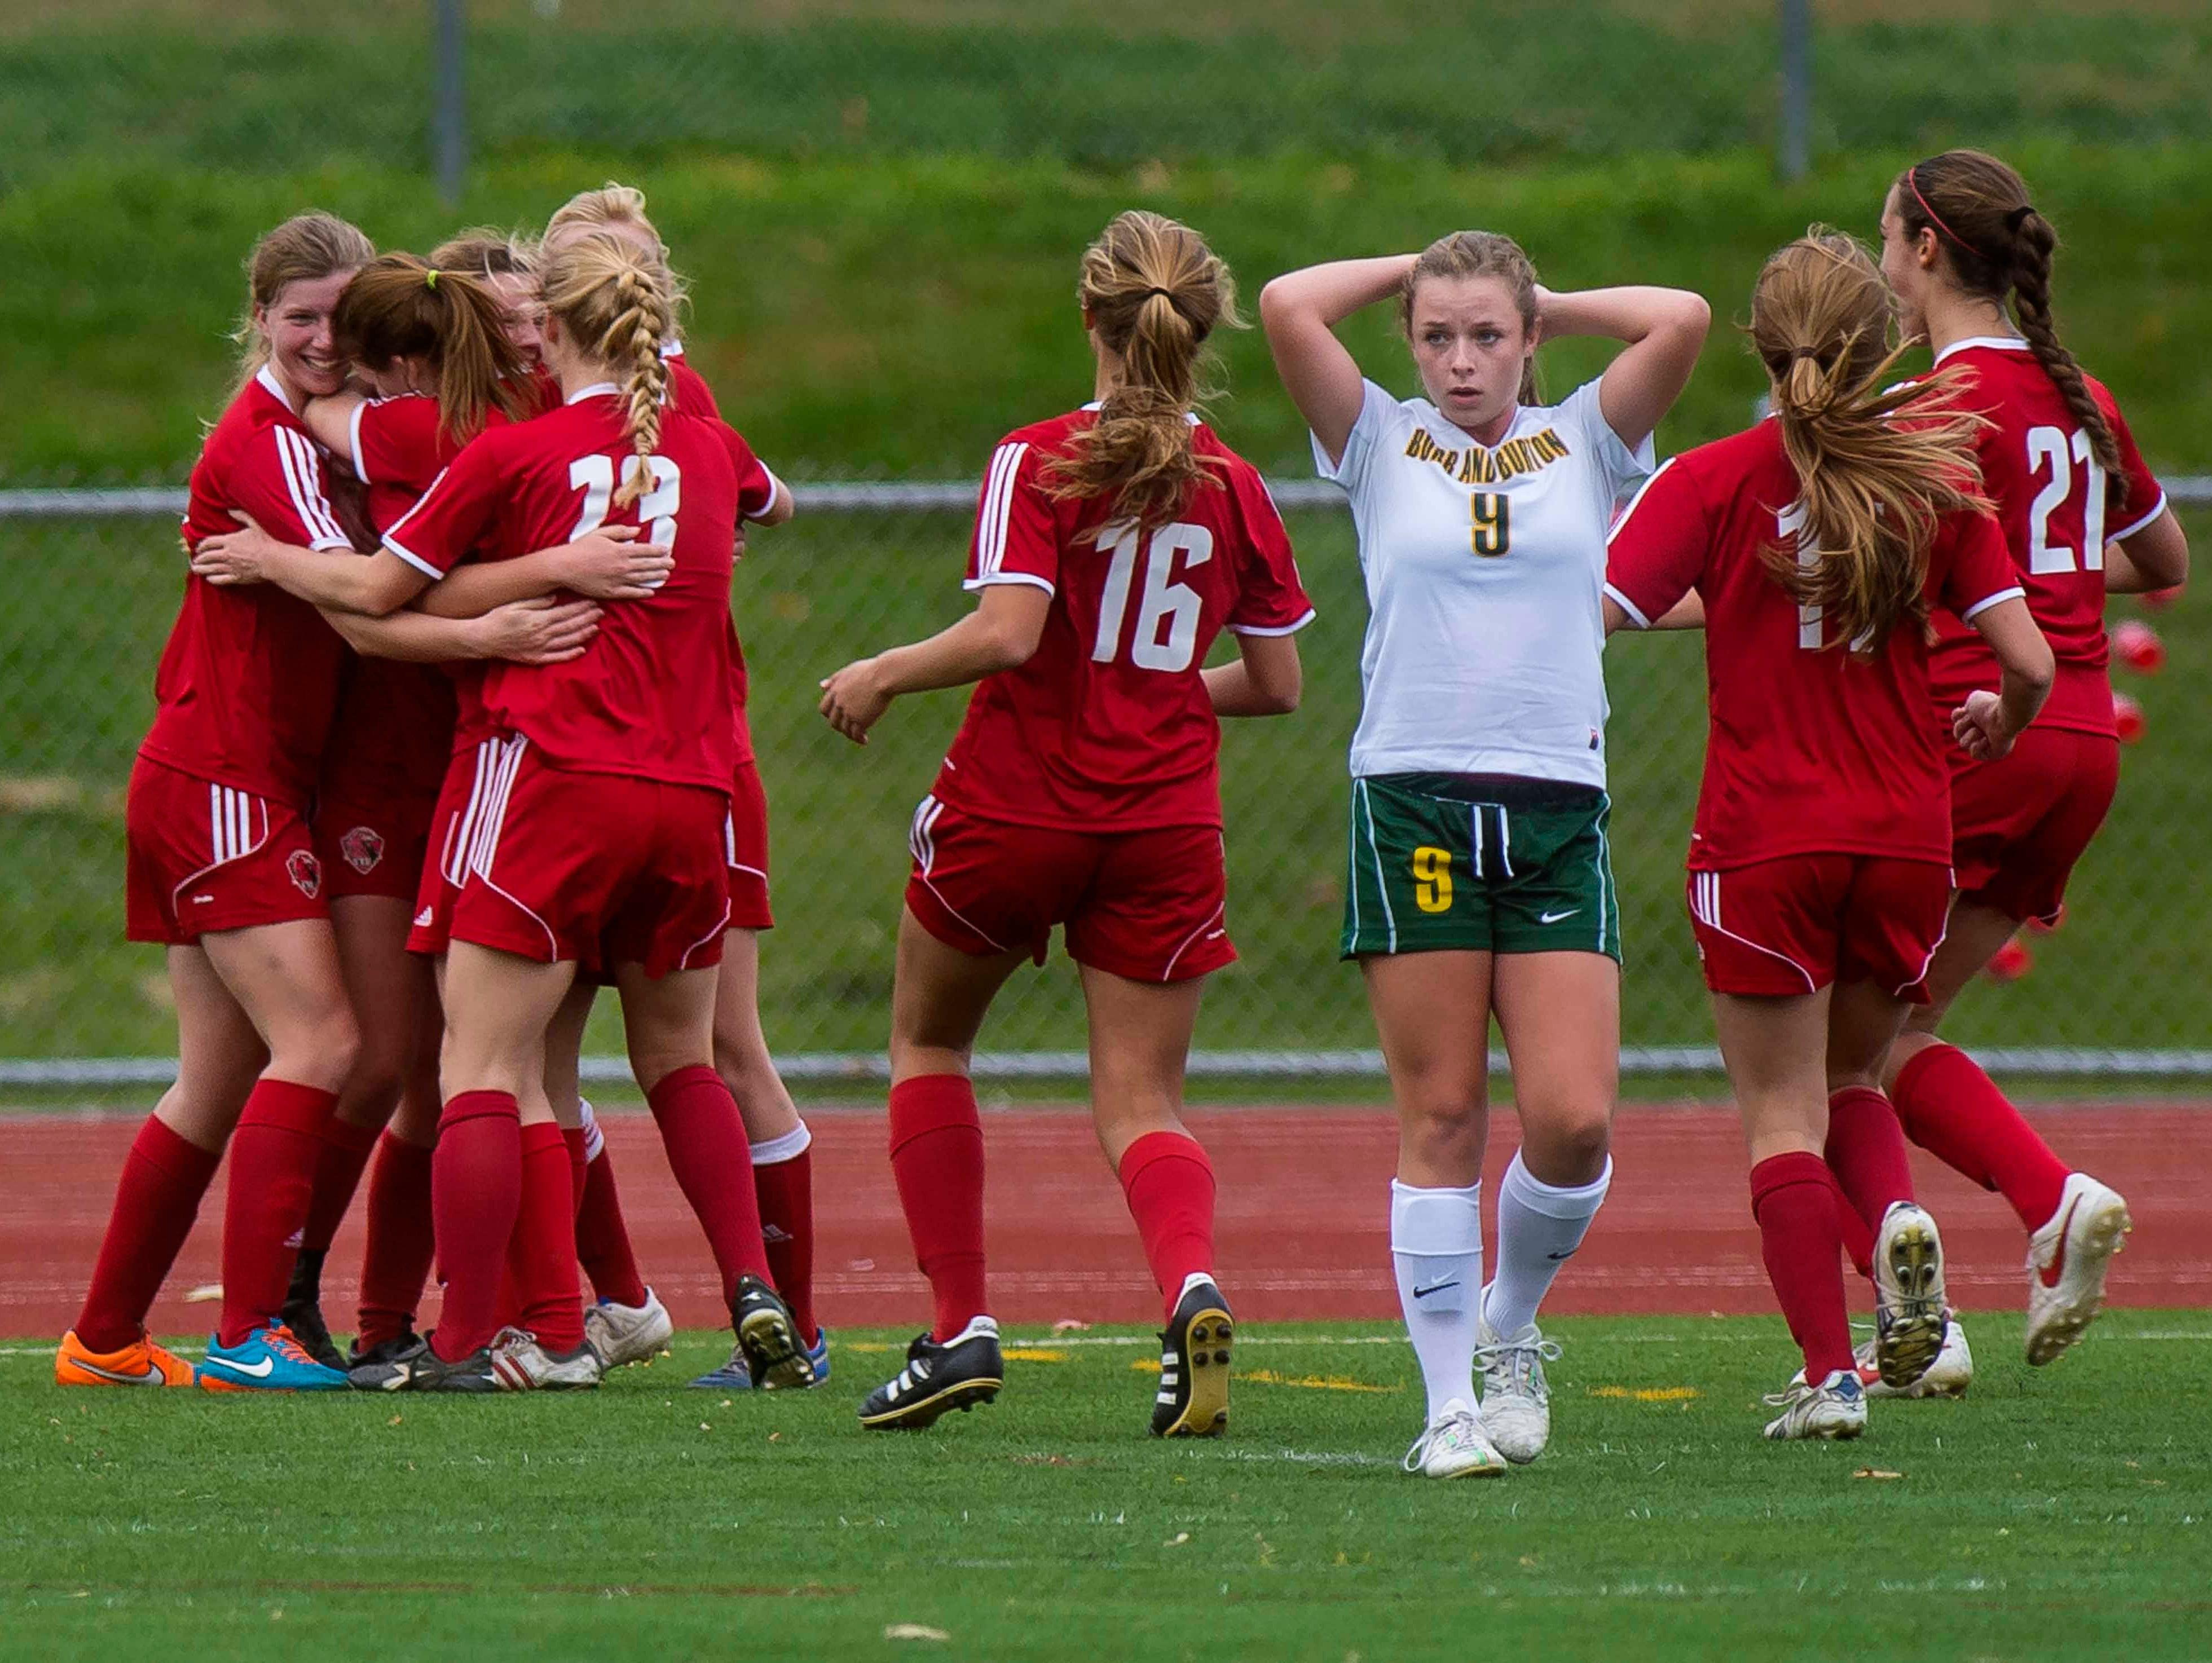 Burr & Burton's Una Langran walks away as CVU celebrates a goal in the Division I girls soccer championship in Burlington on Saturday, October 31, 2015.